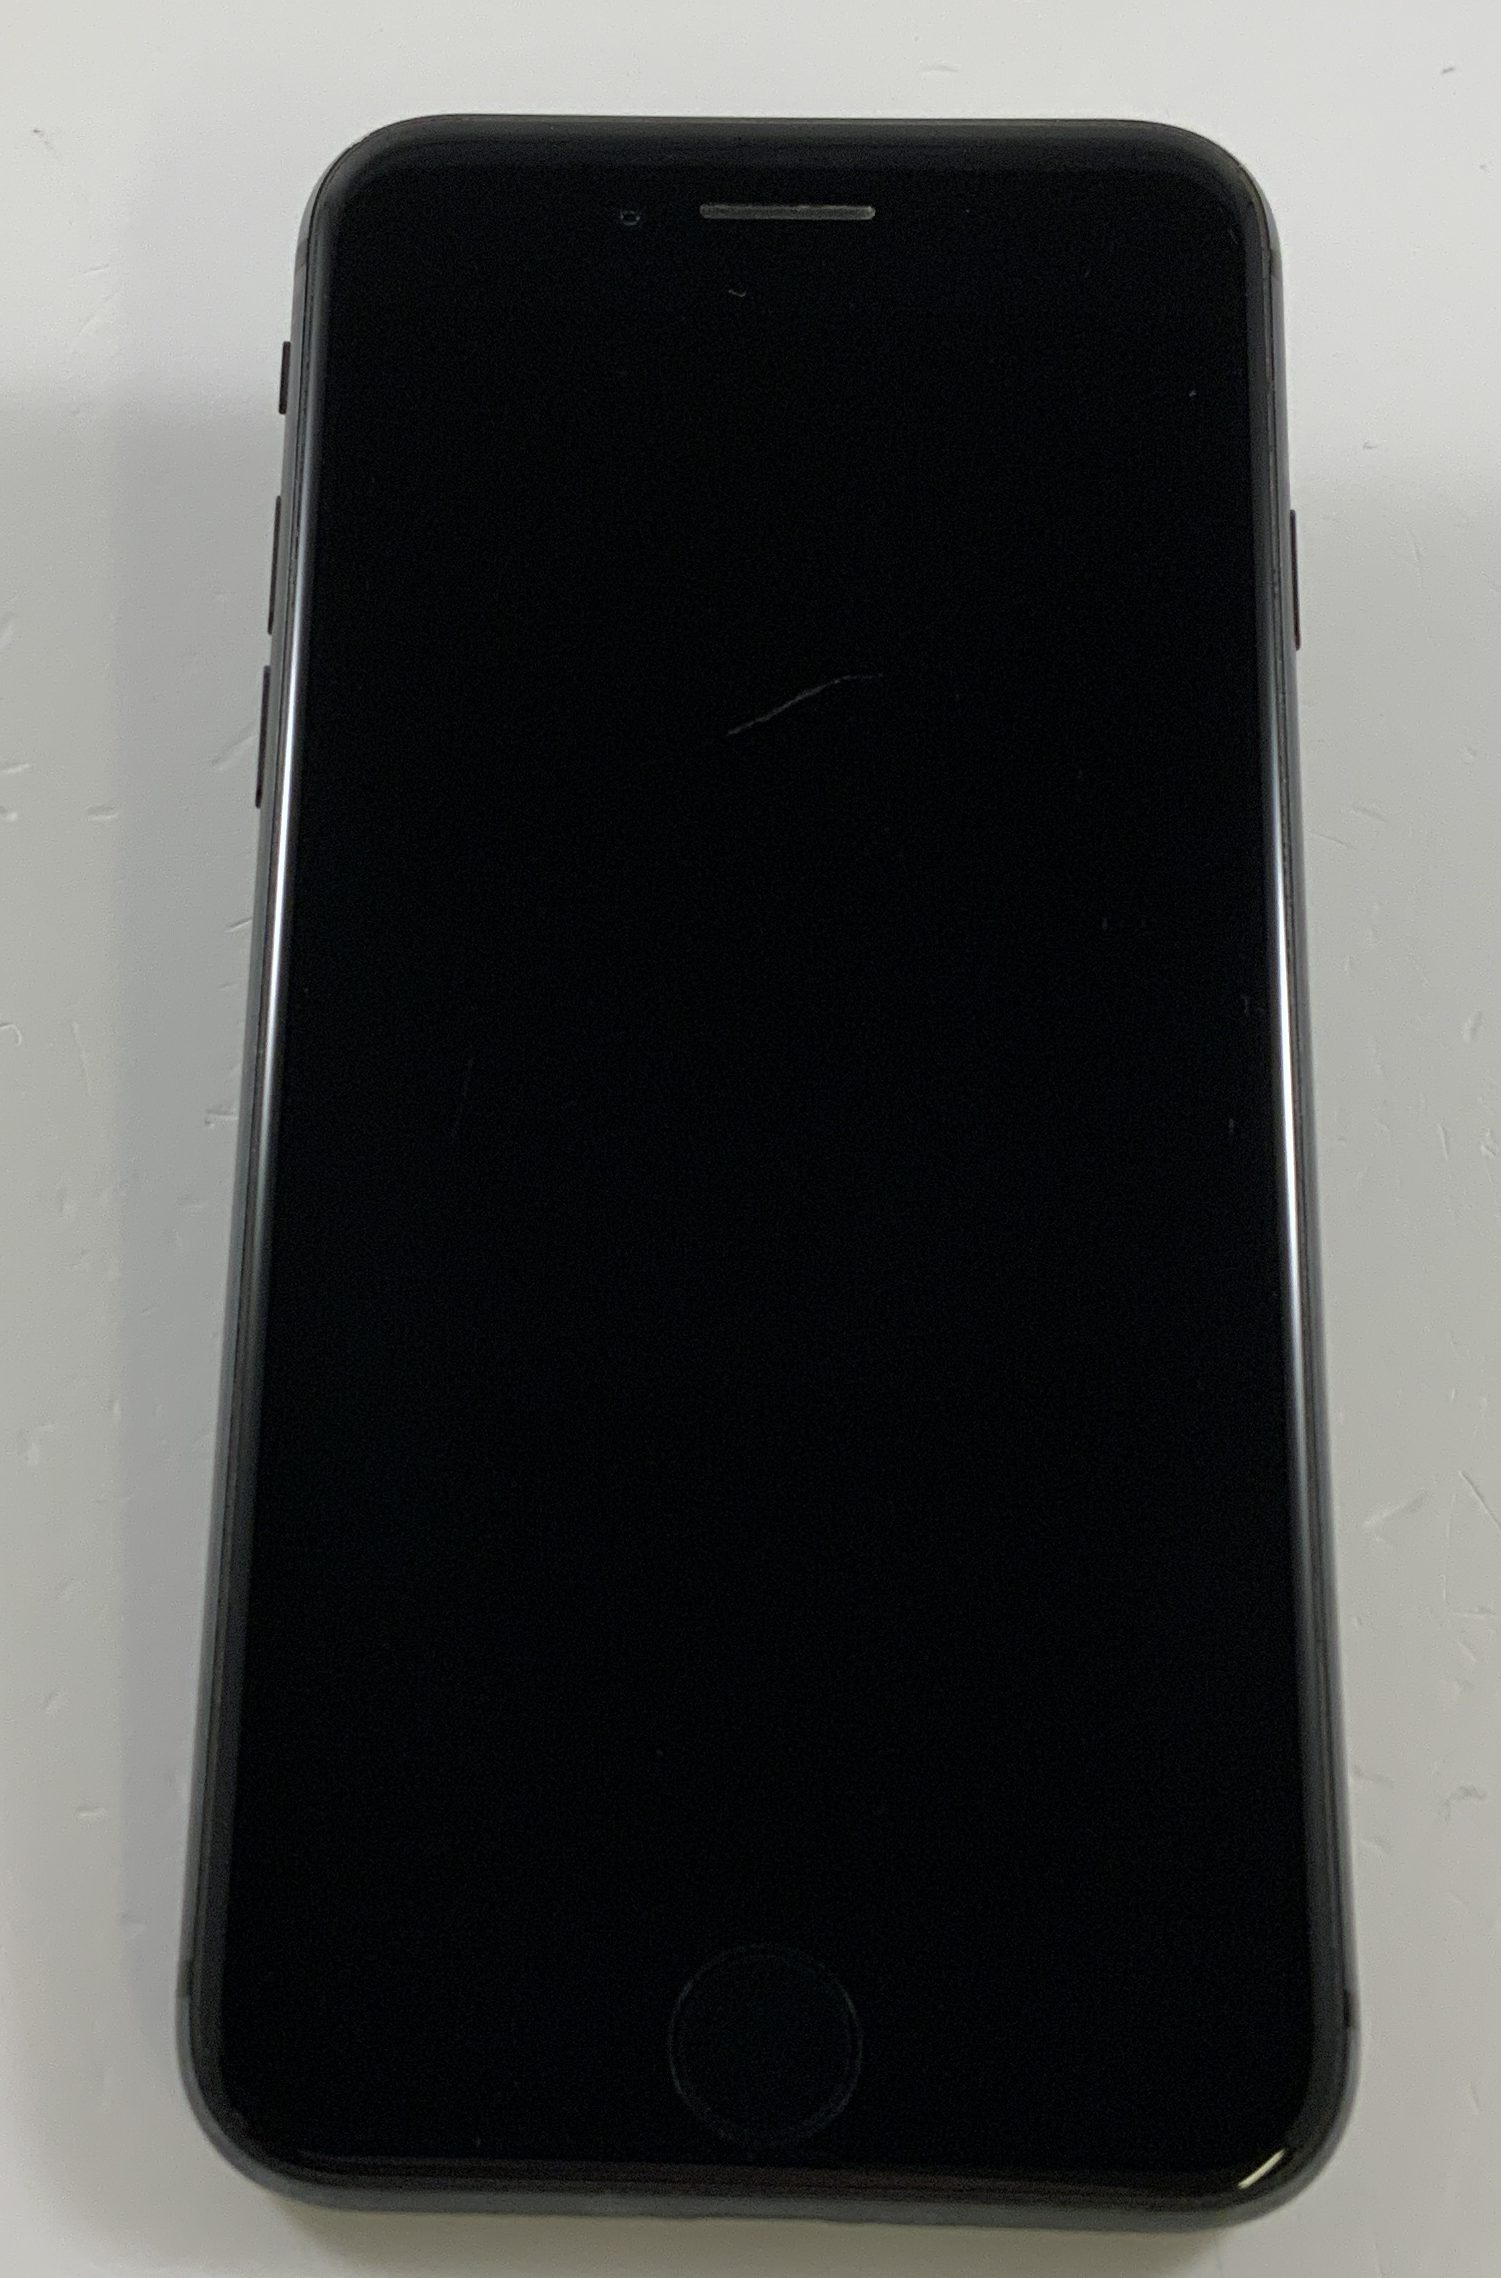 iPhone 8 64GB, 64GB, Space Gray, Bild 1